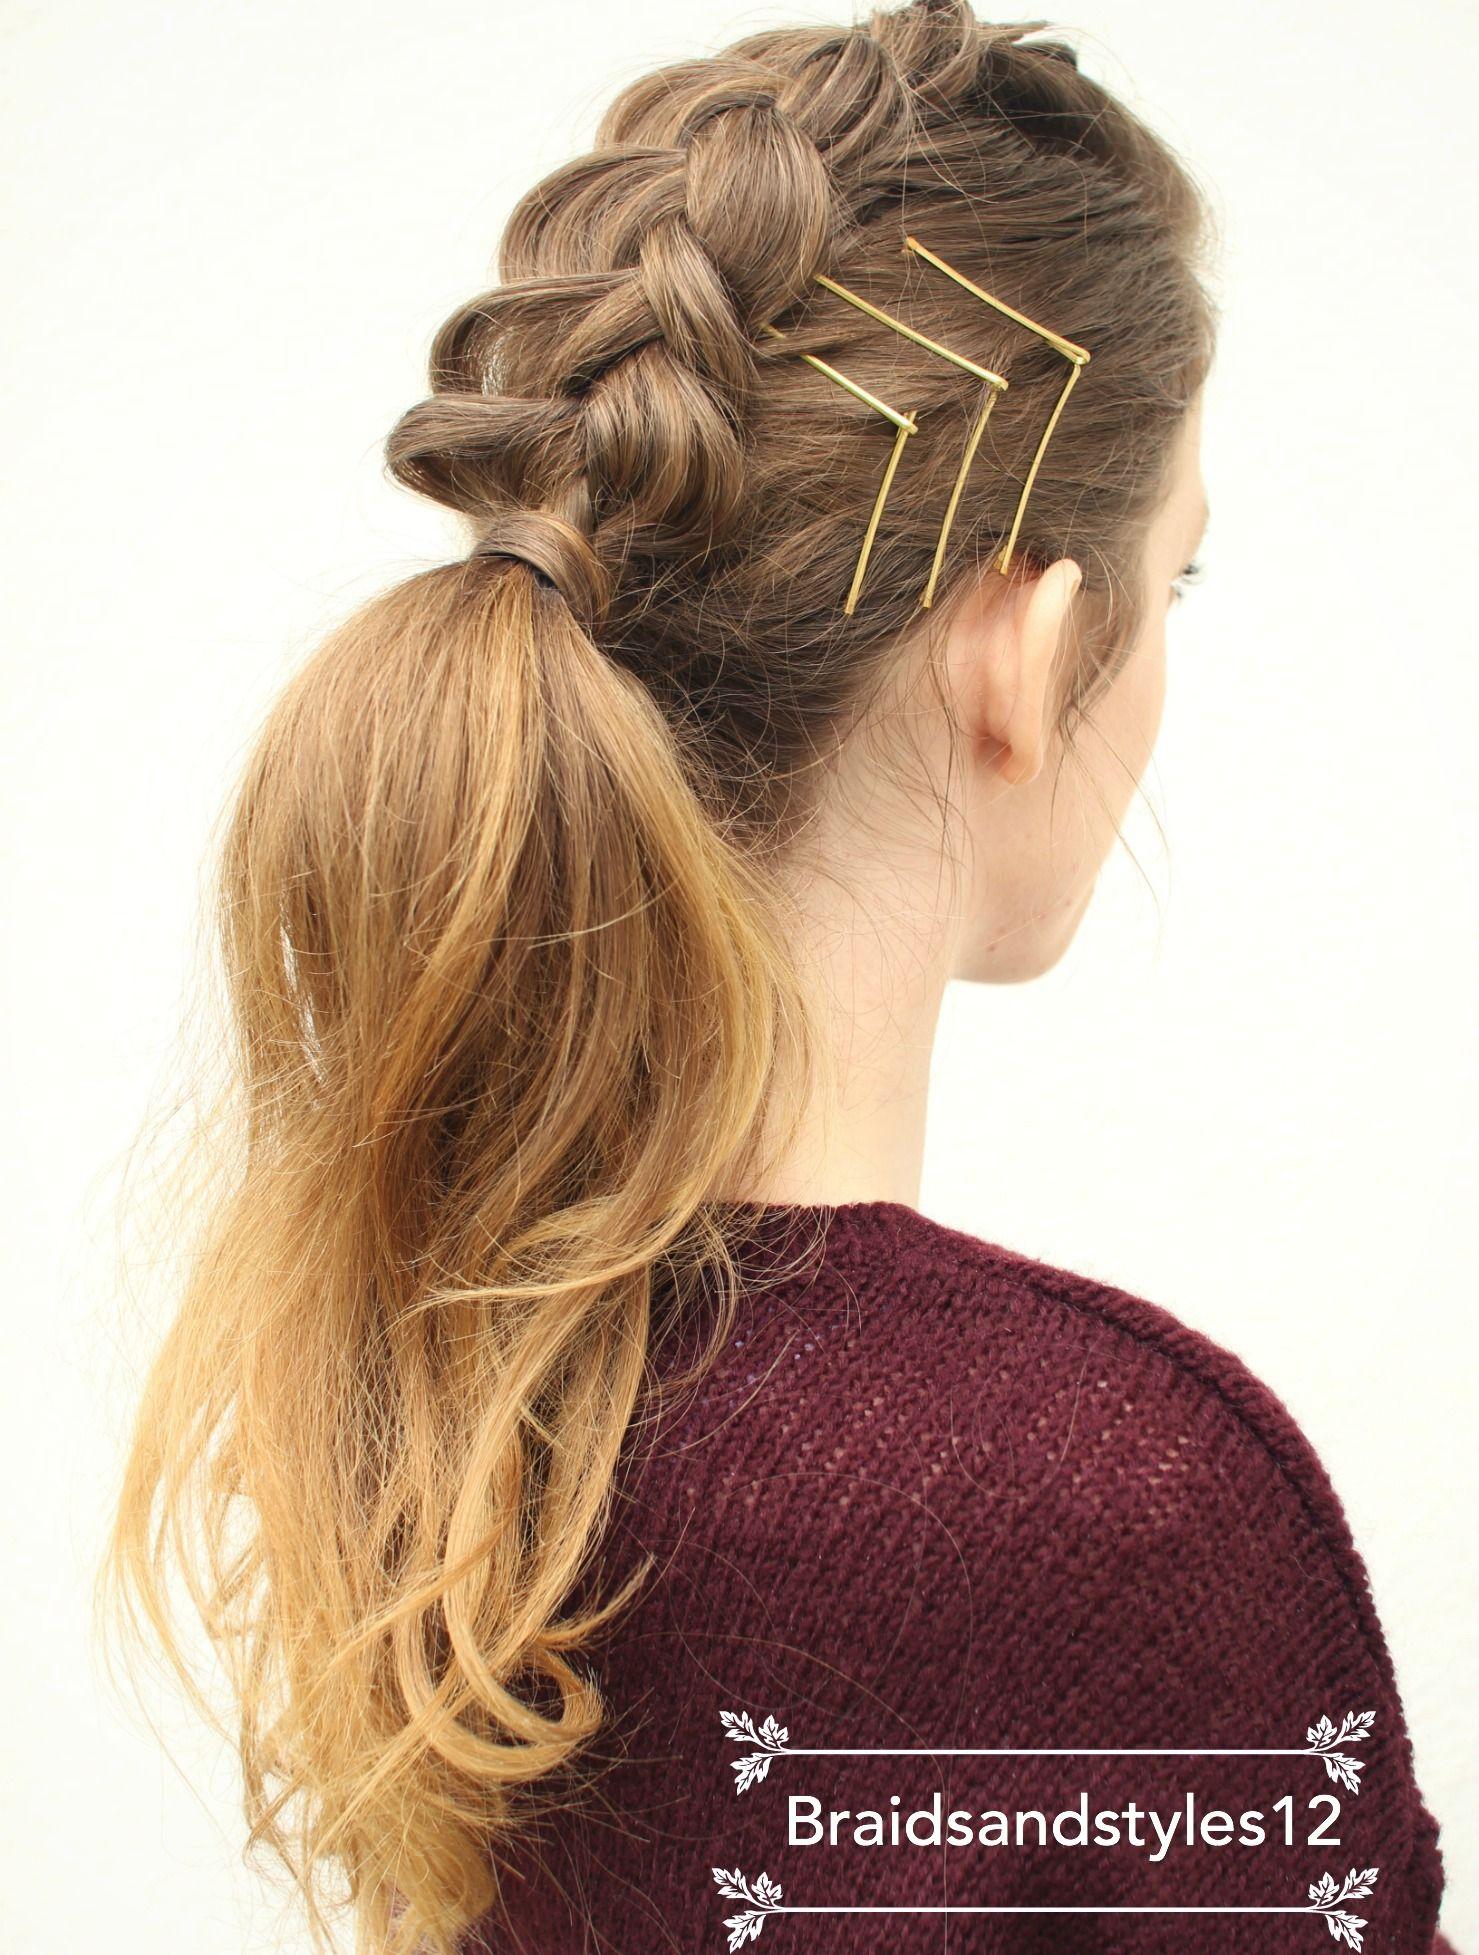 braidsandstyles12 | ponytail, hair style and diy hair